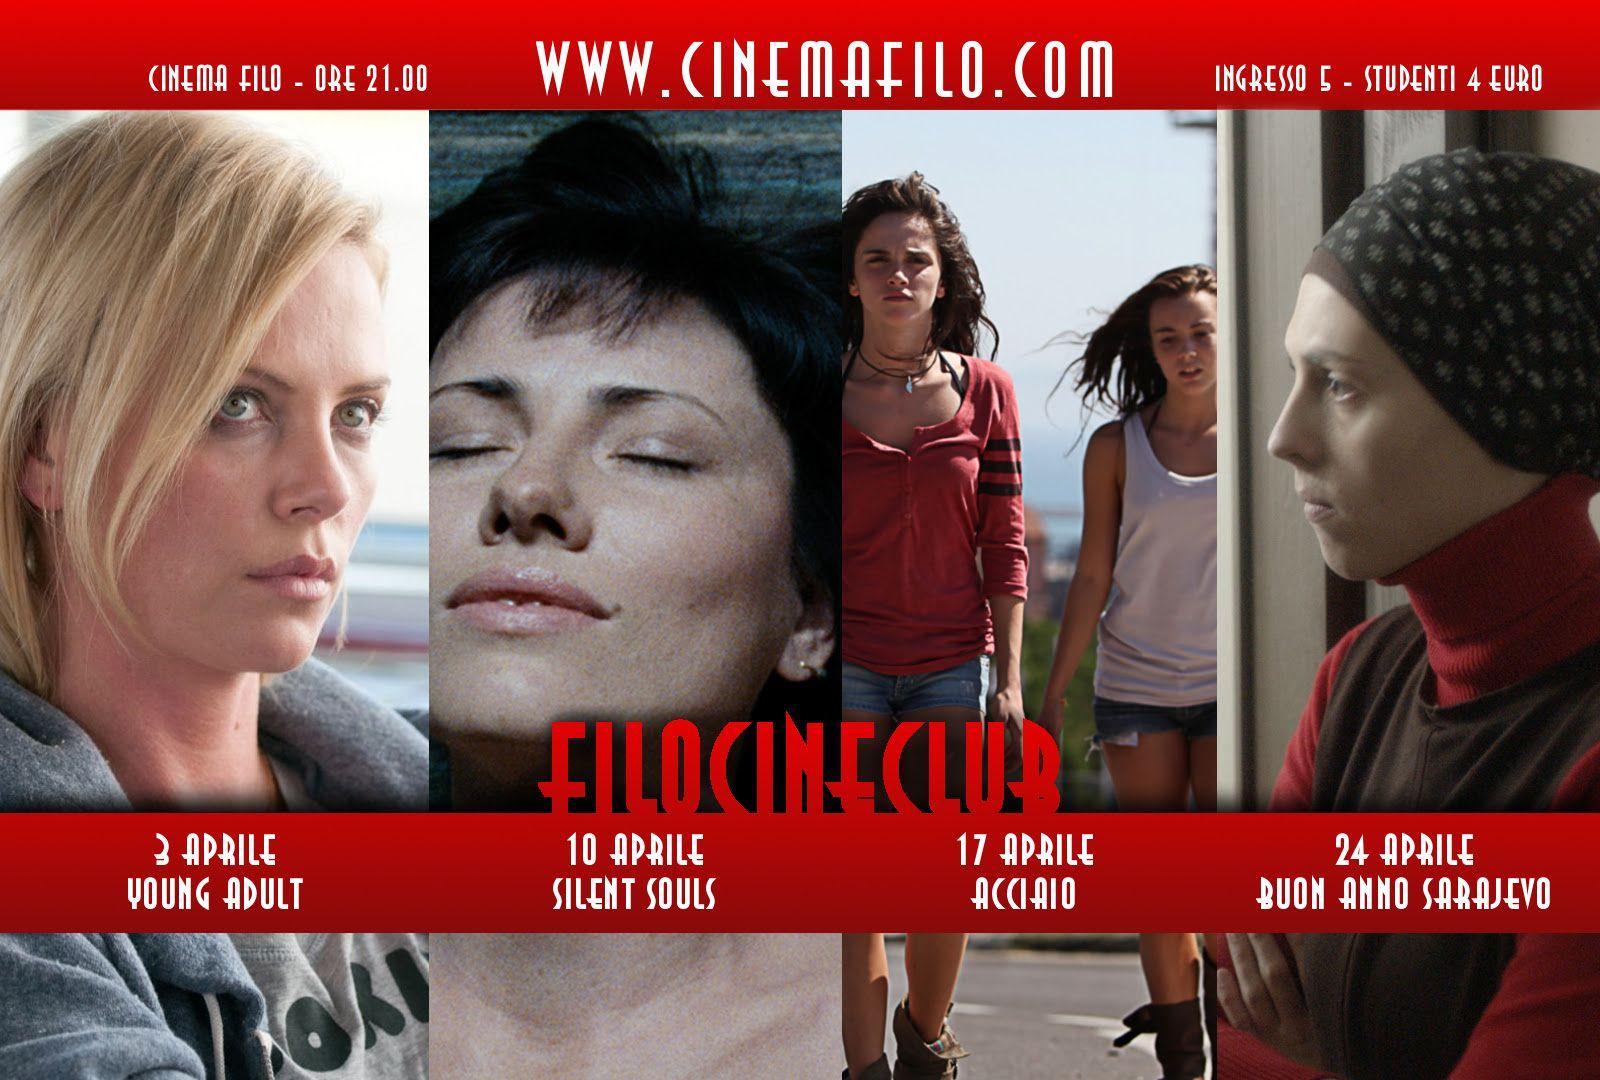 aprile Film, Cinema